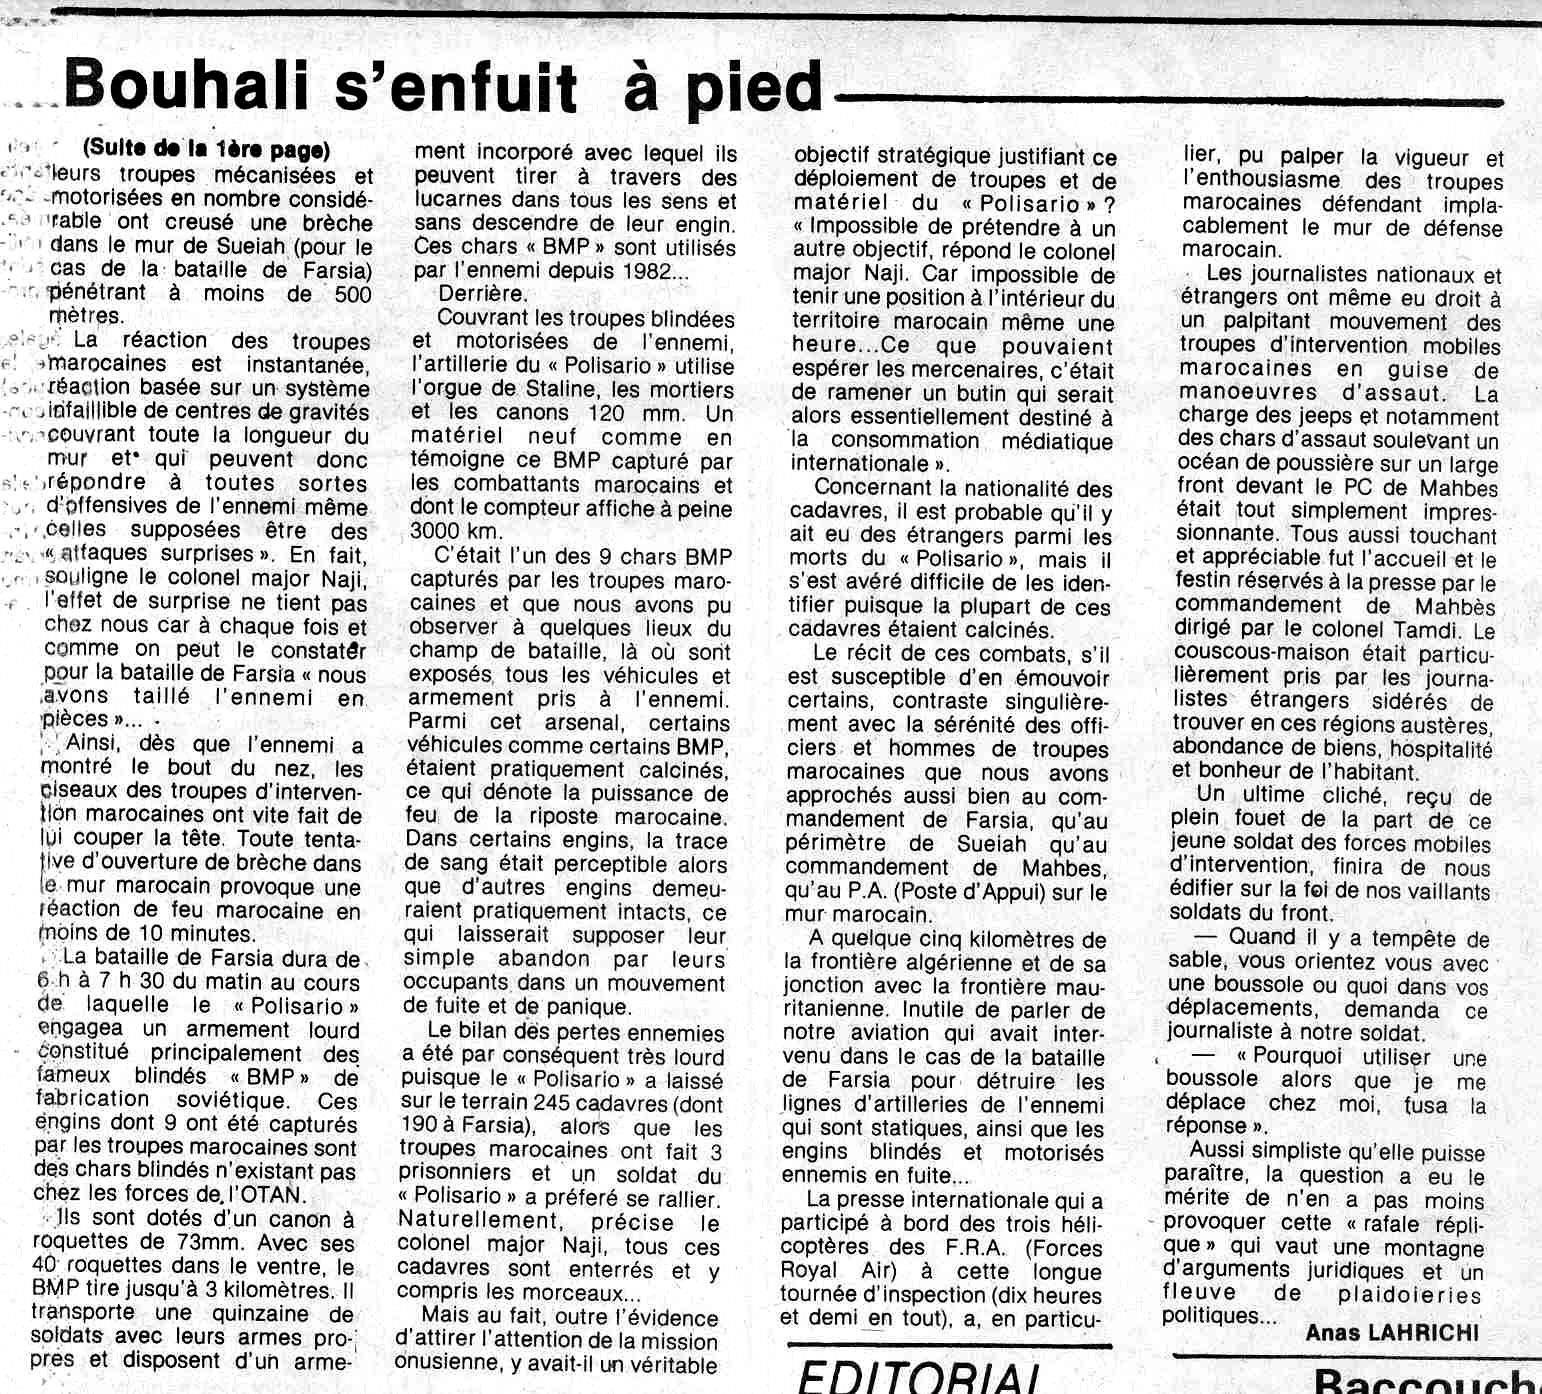 La Bataille de Farsia - 18 novembre 1987 50614975713_d099ab6c32_o_d